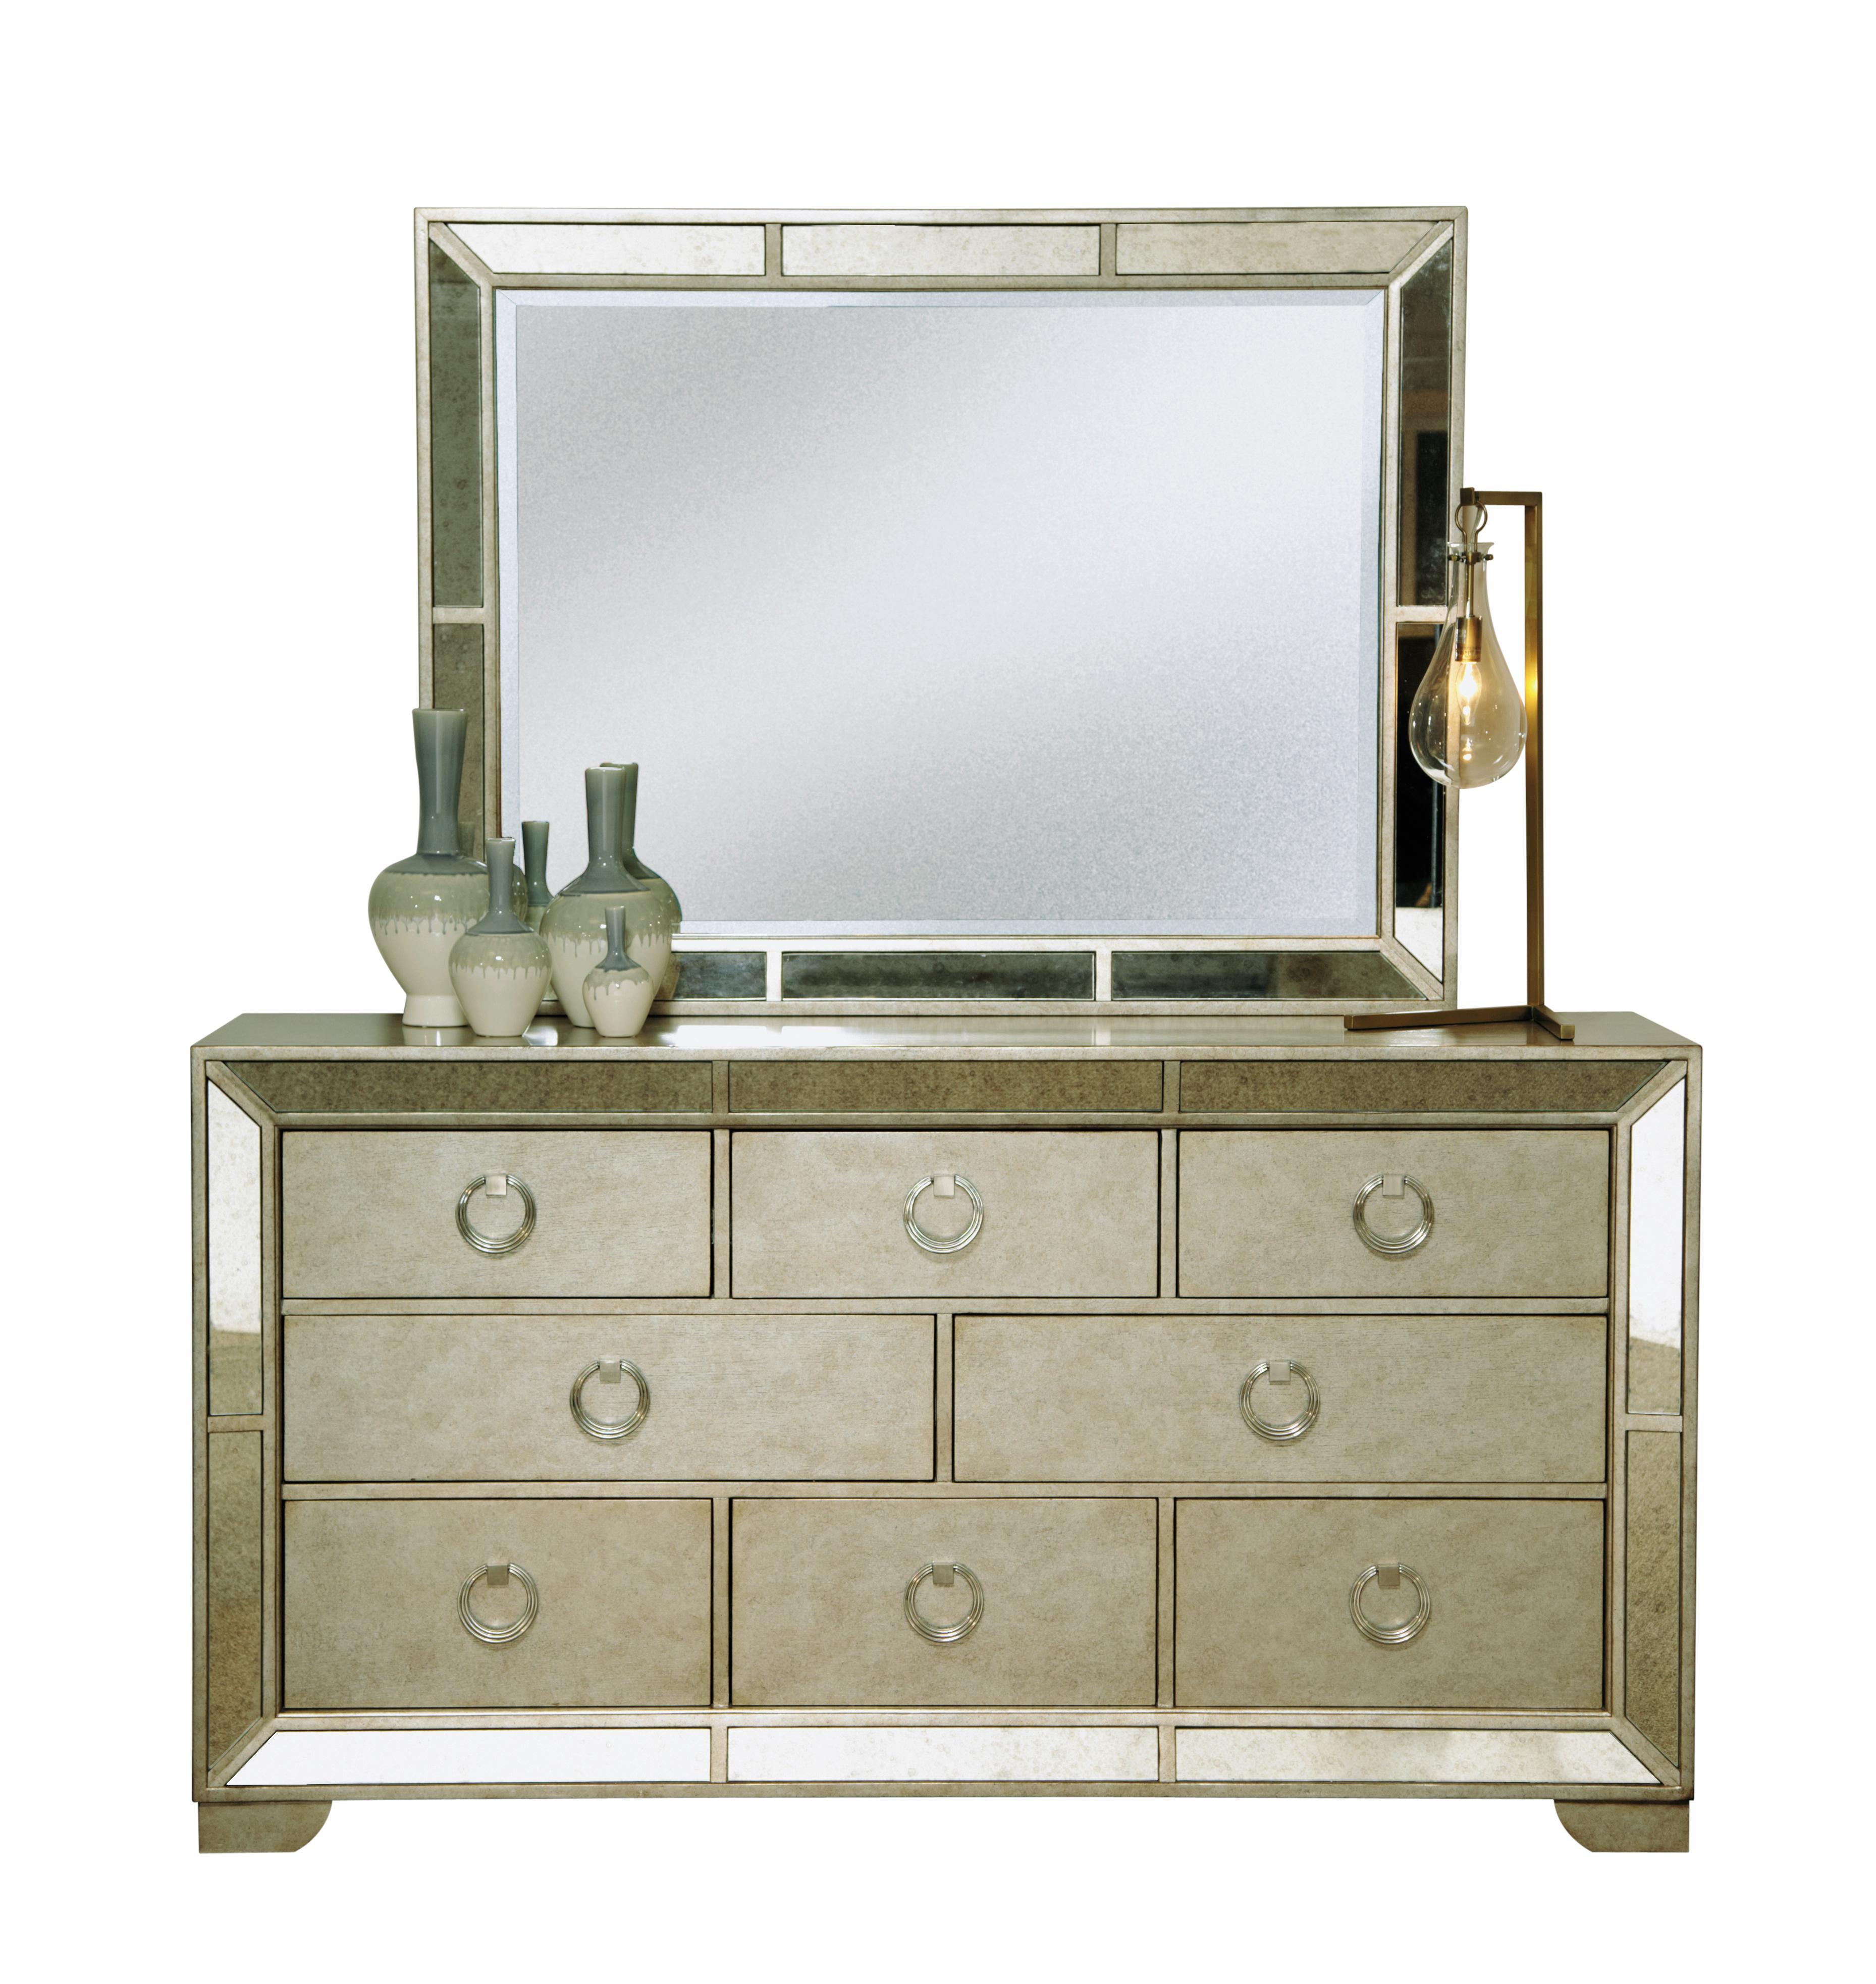 Pulaski Furniture Farrah Dresser & Mirror Set - Item Number: 395100+110